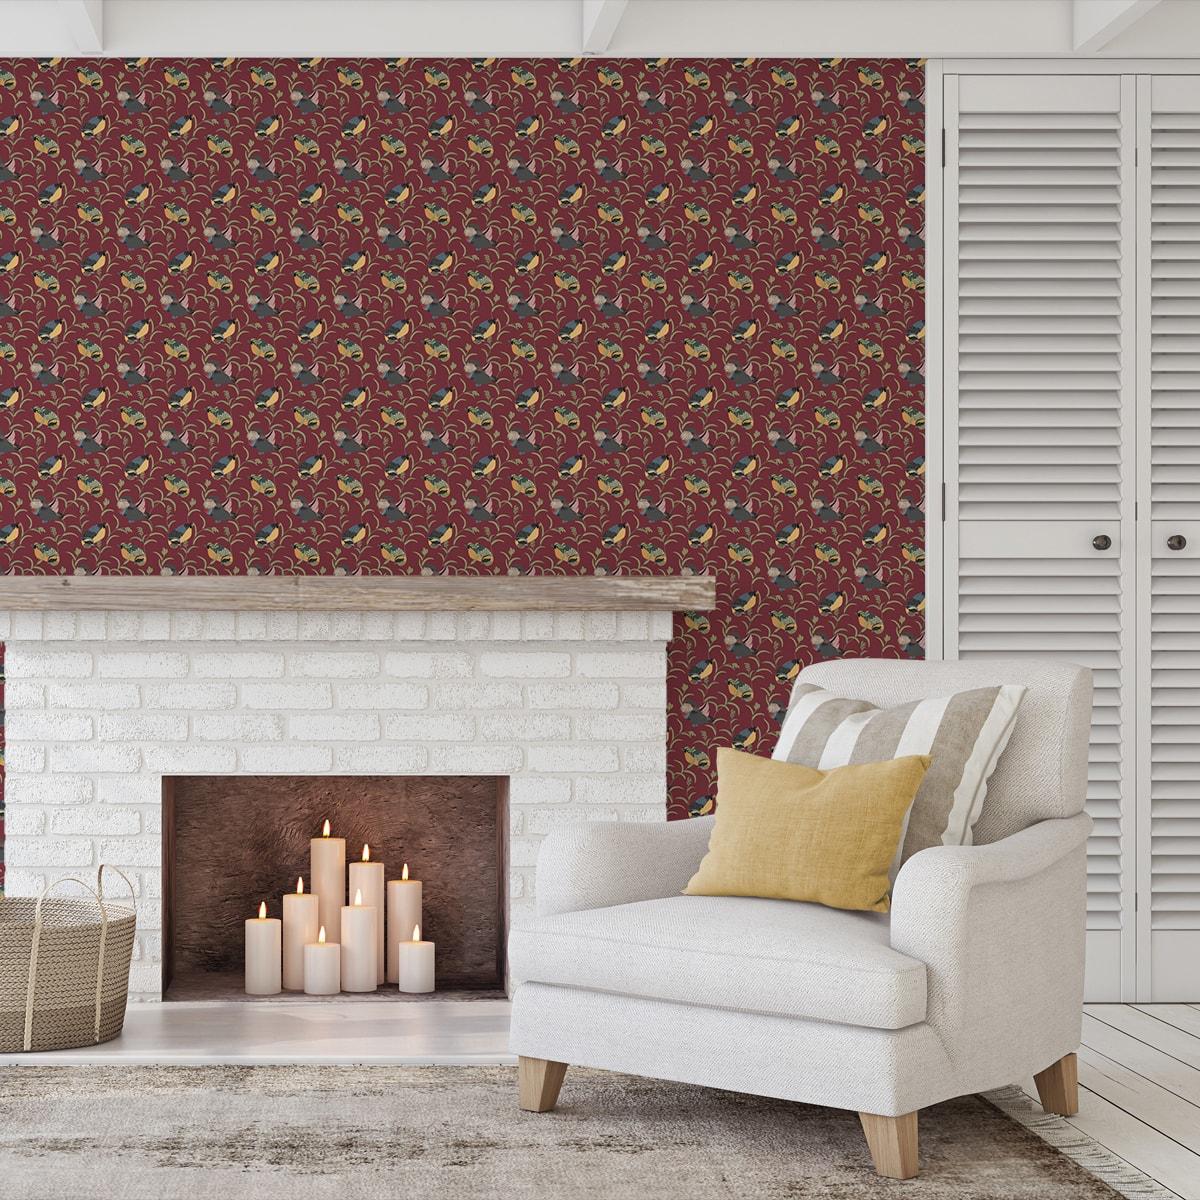 feine rote tapete im schlossteich mit enten im schilf angepasst an farrow and ball wandfarben. Black Bedroom Furniture Sets. Home Design Ideas